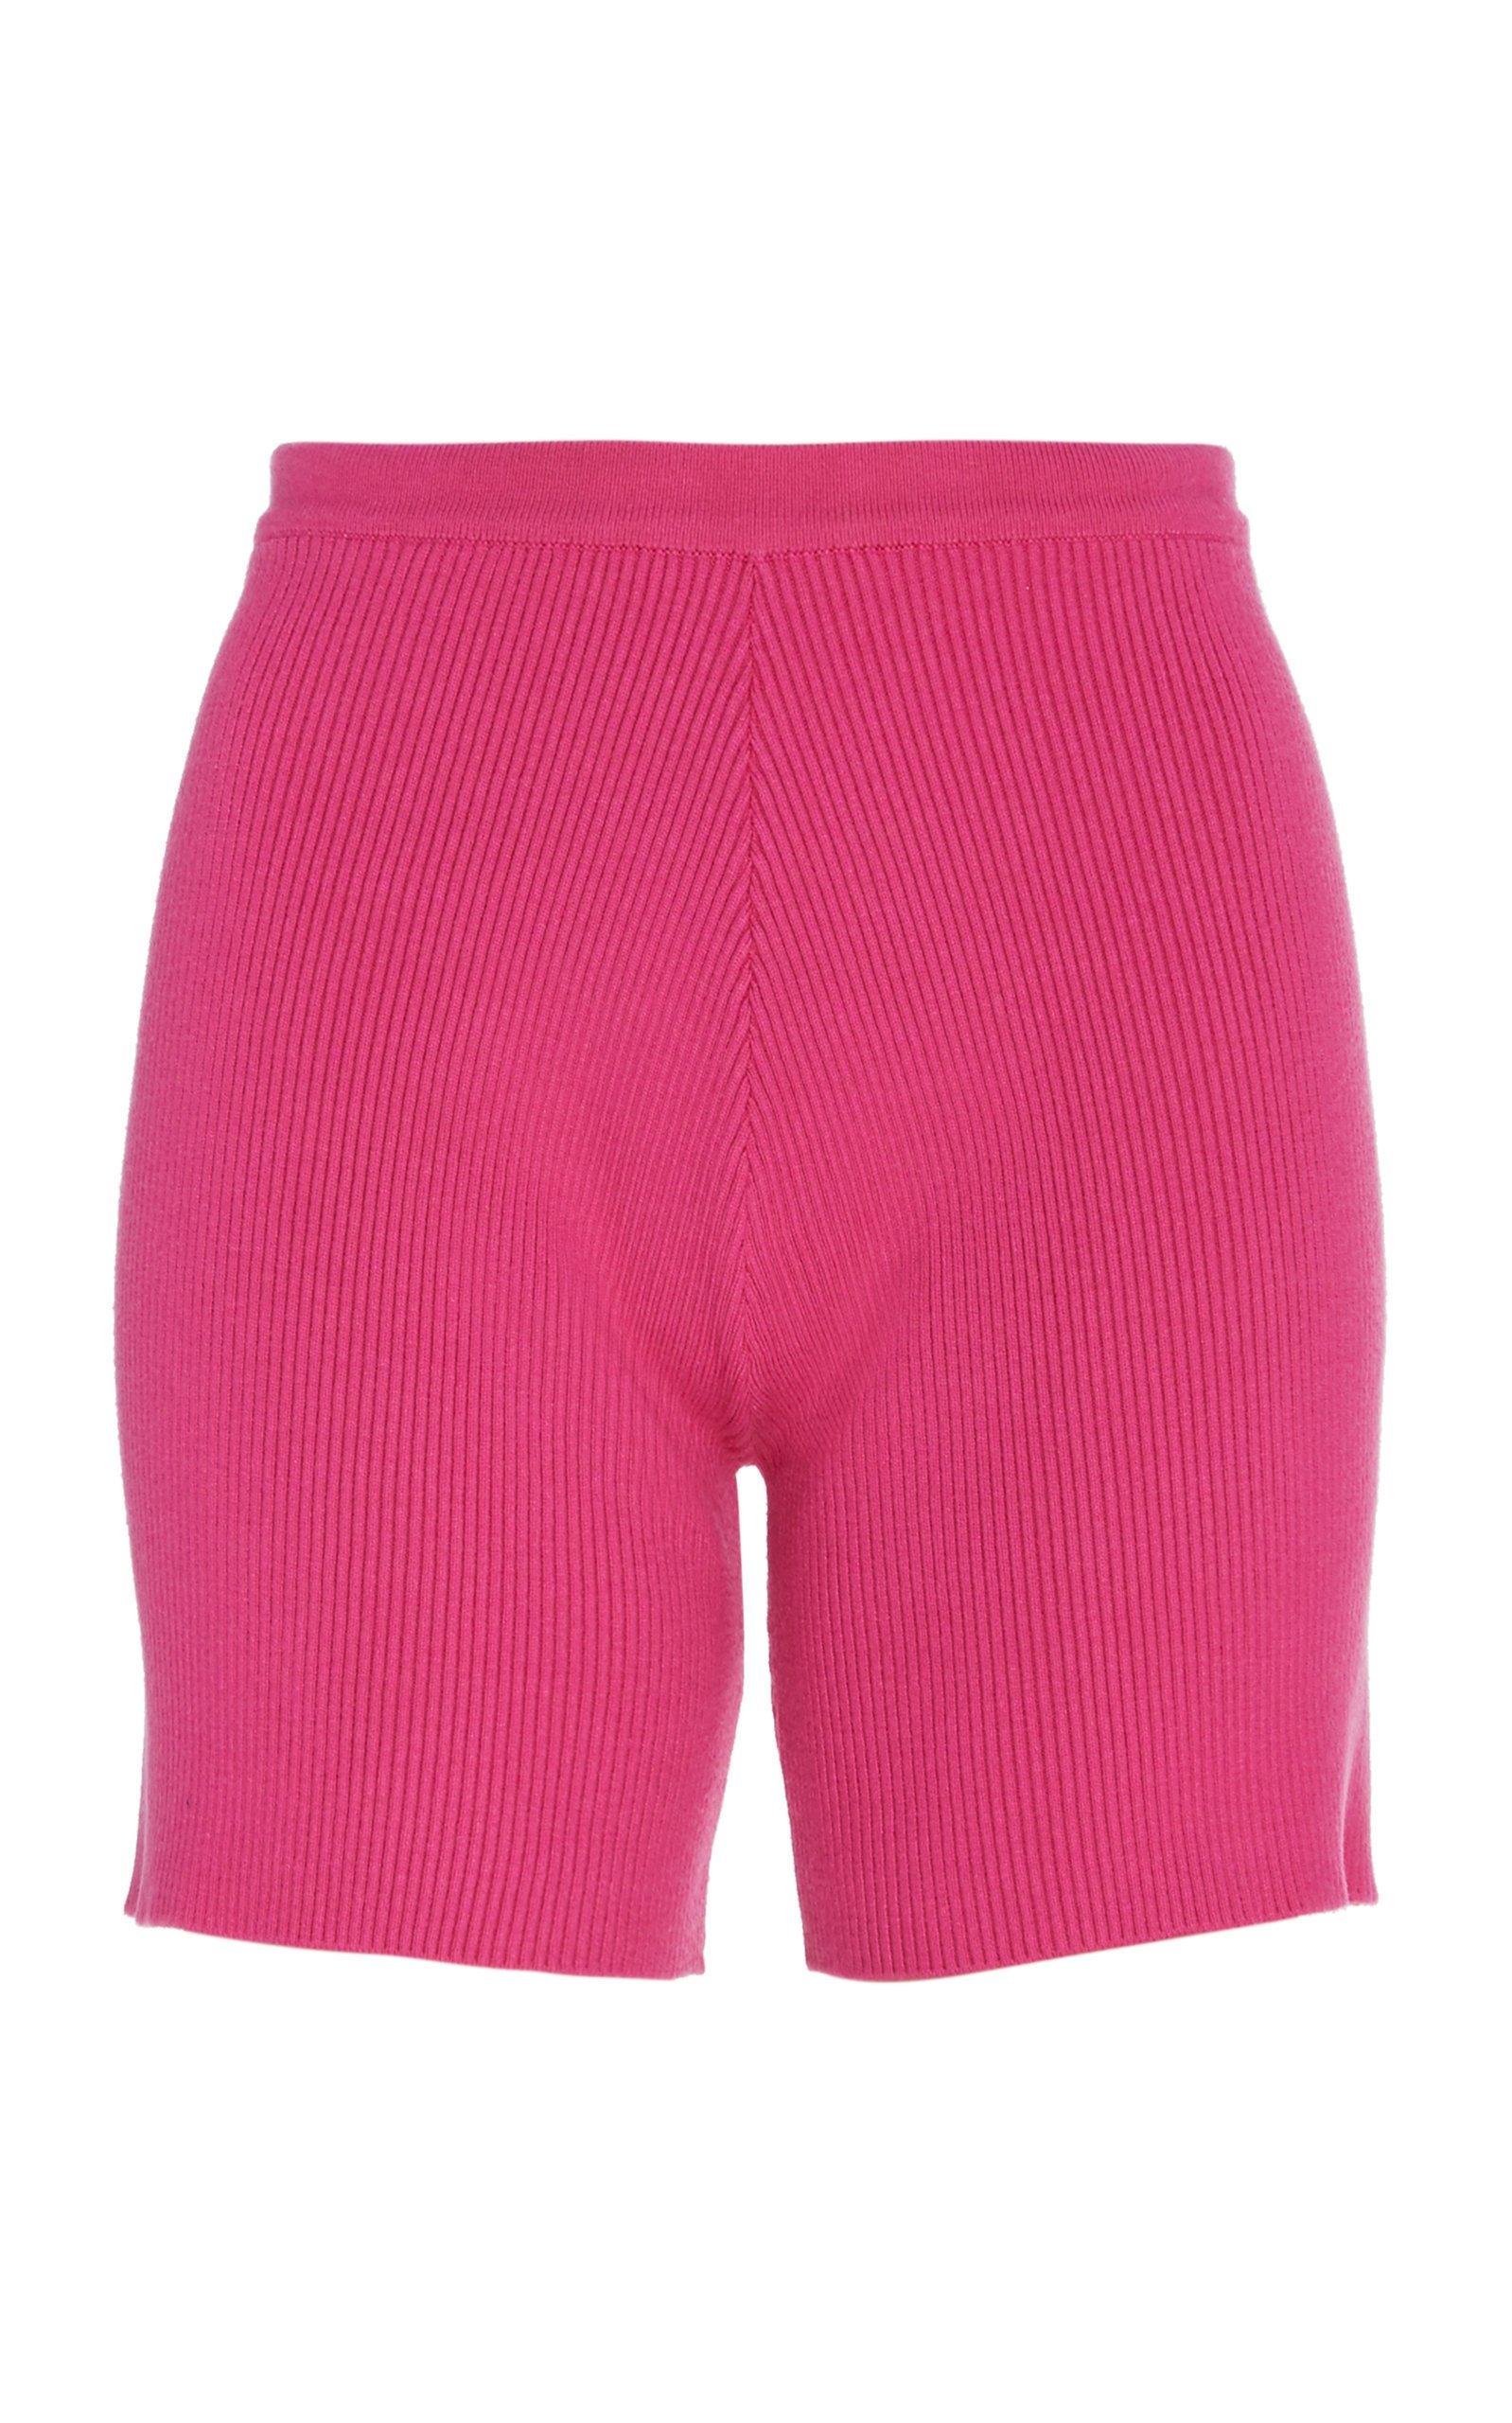 Apparis Penny Colored Biker Shorts Size: XL